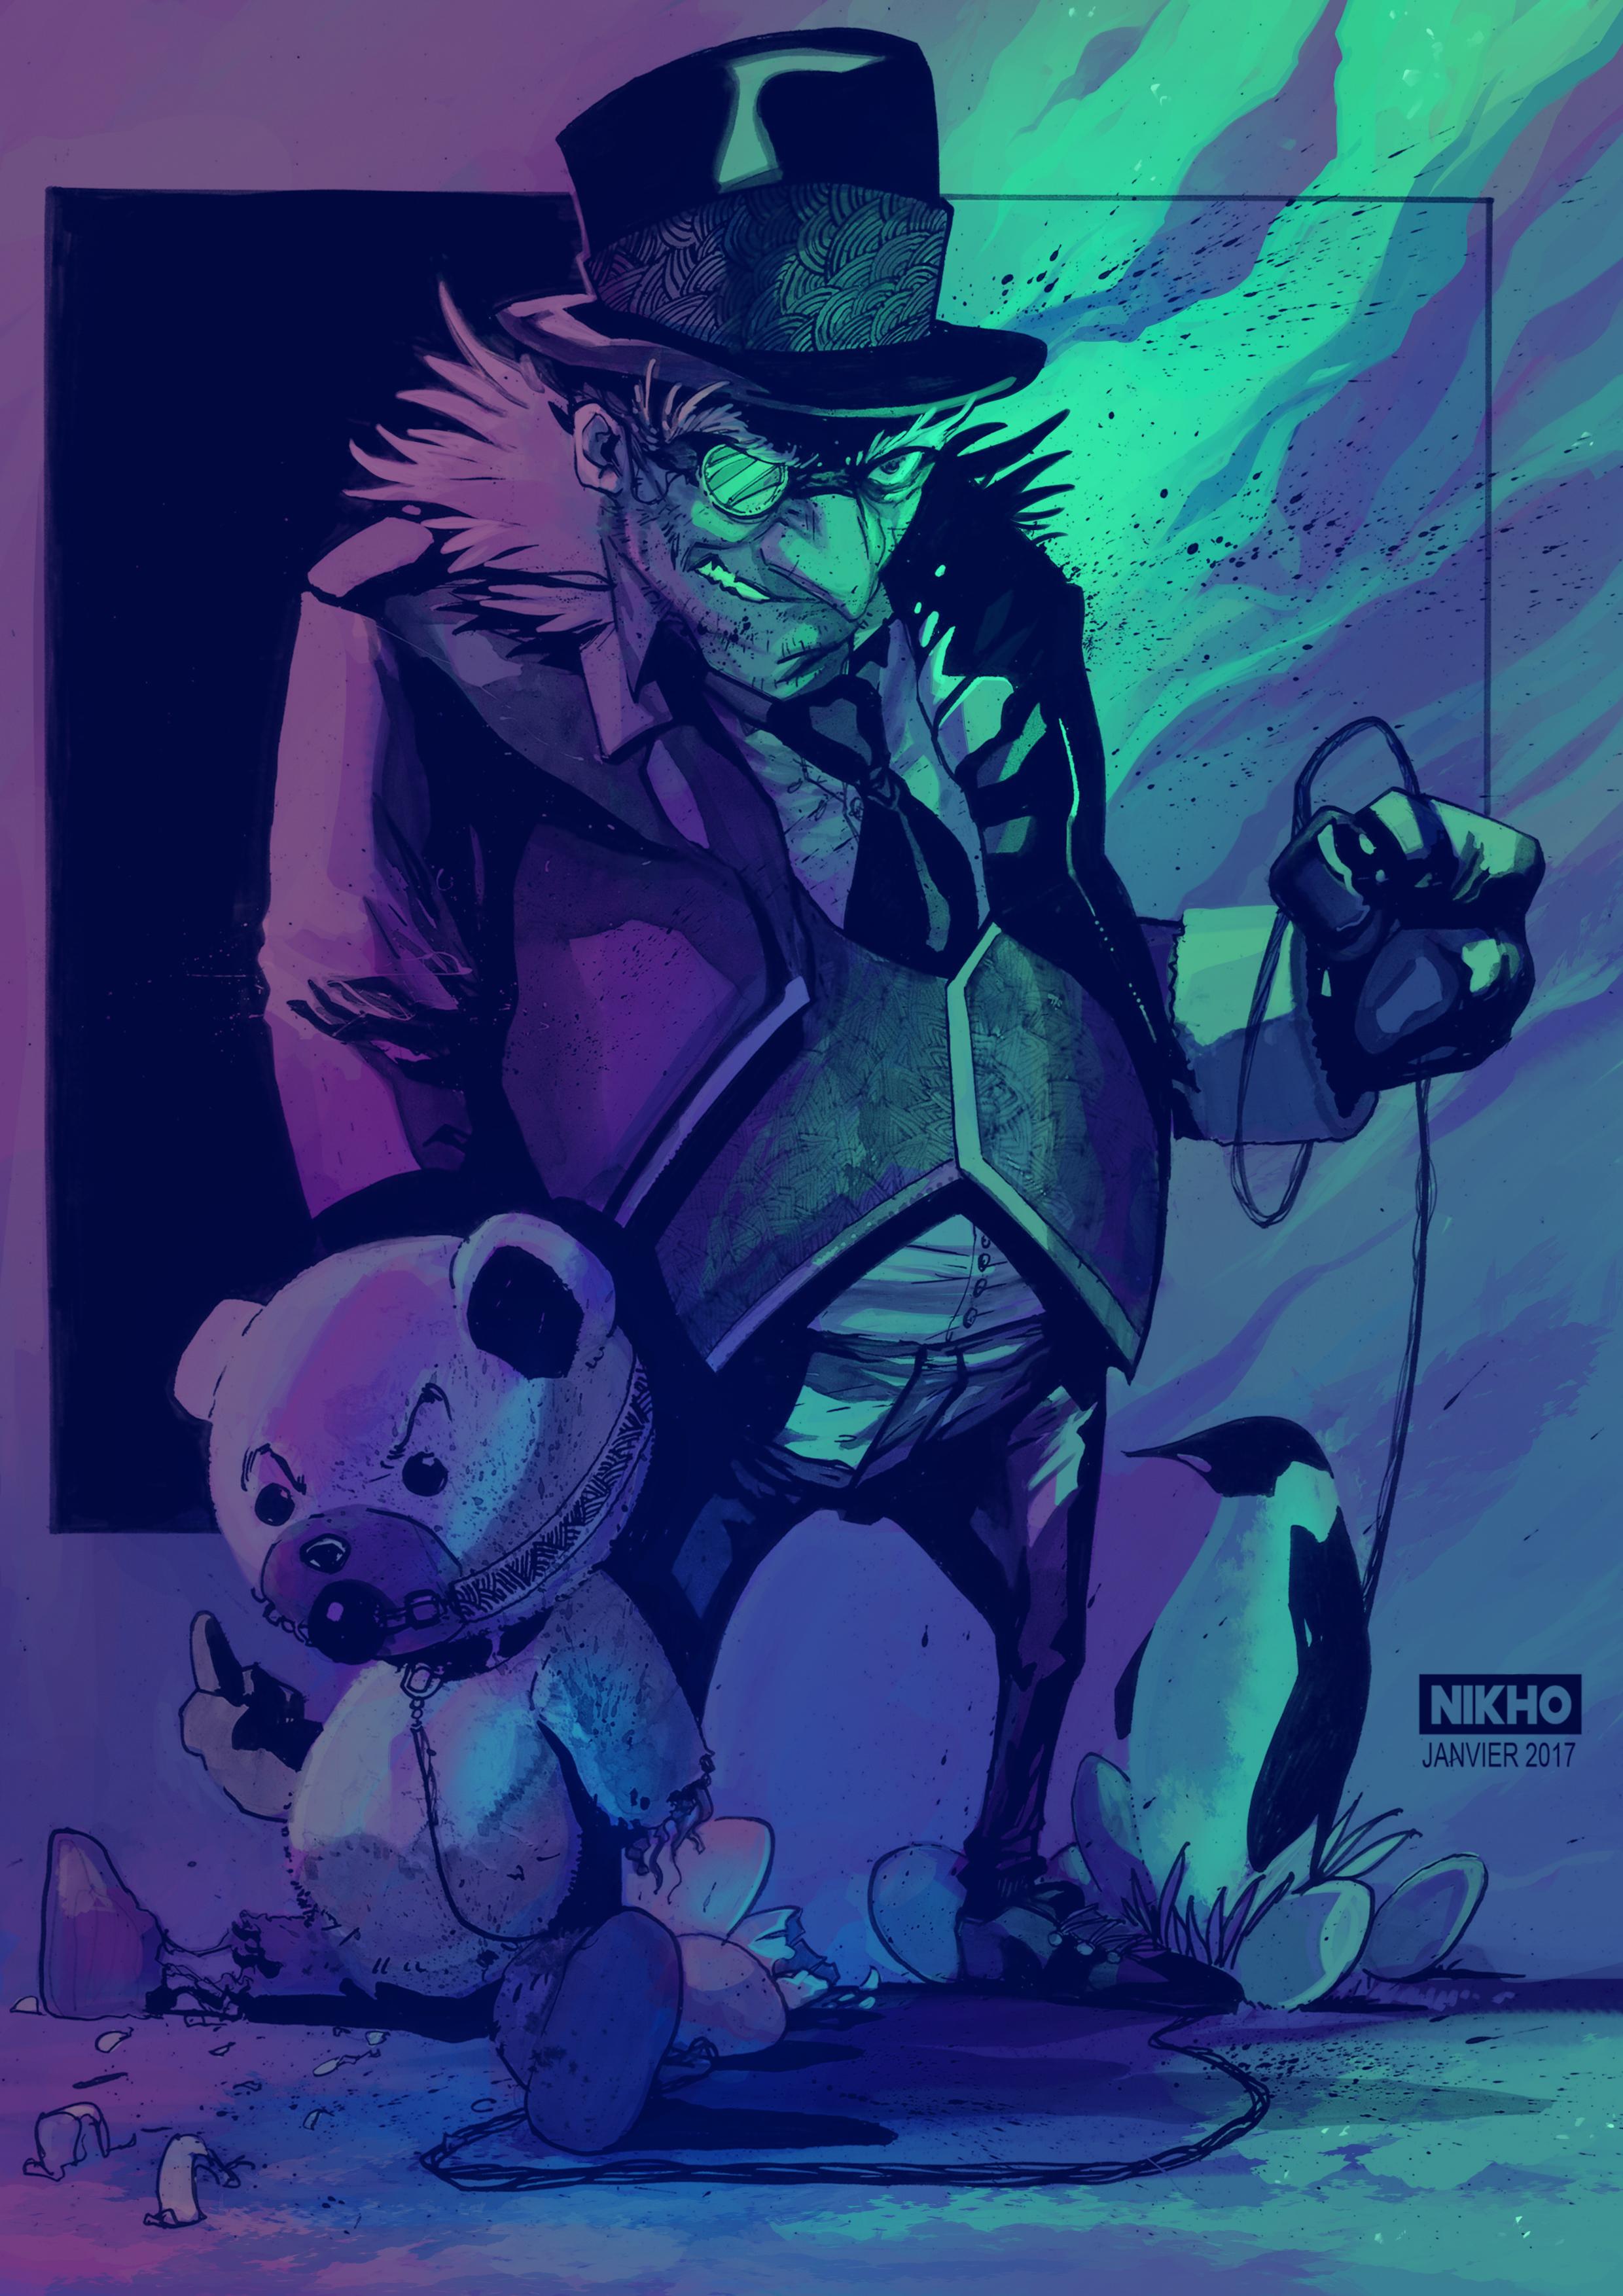 NIKHO - PINGOUIN ET TED